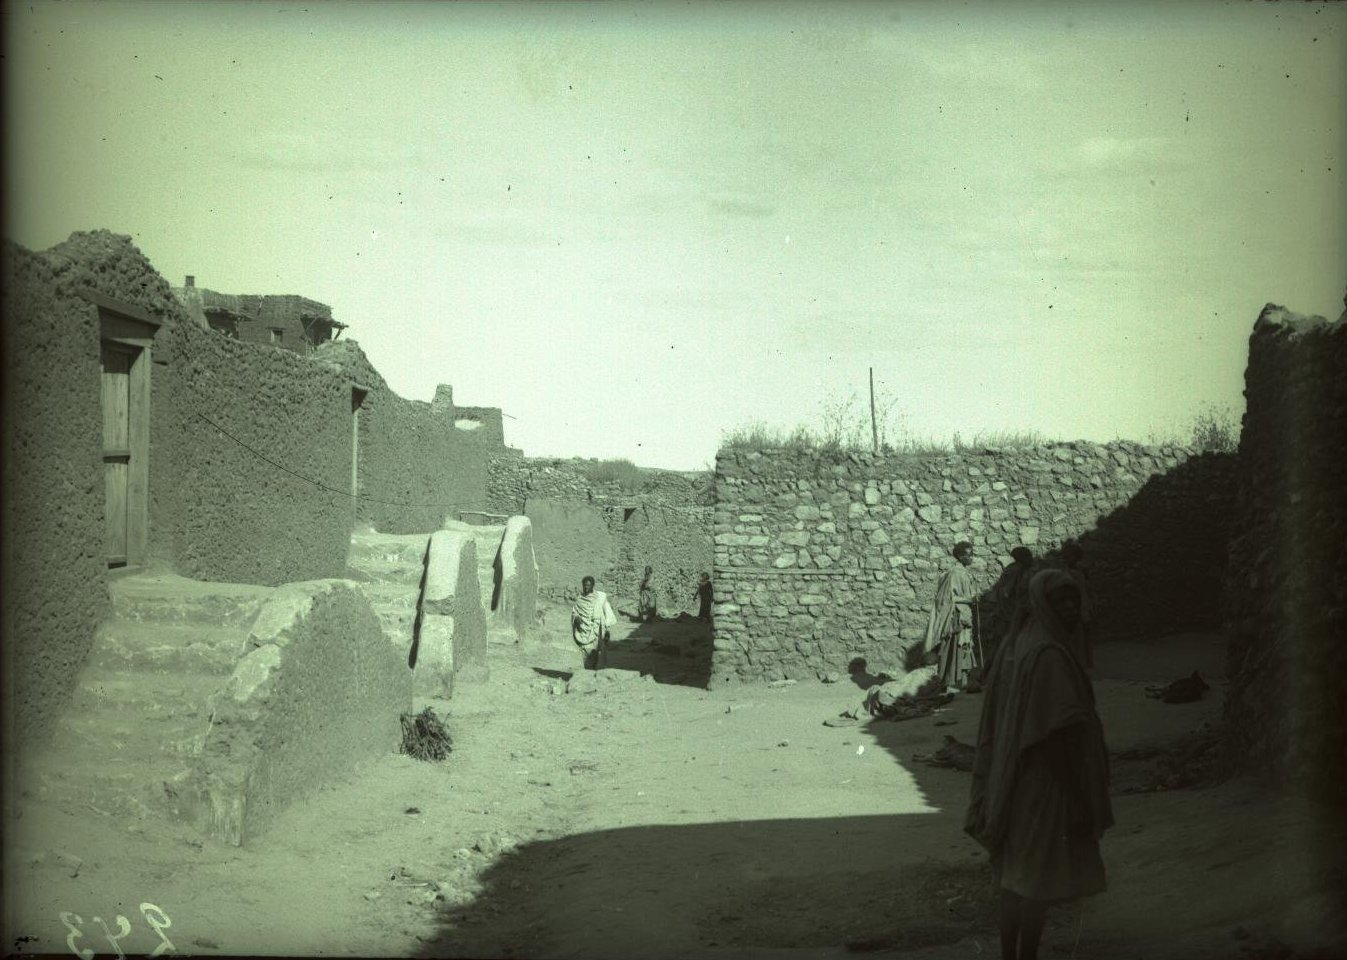 243. Абиссиния, провинция Харар, г. Харар. Улица